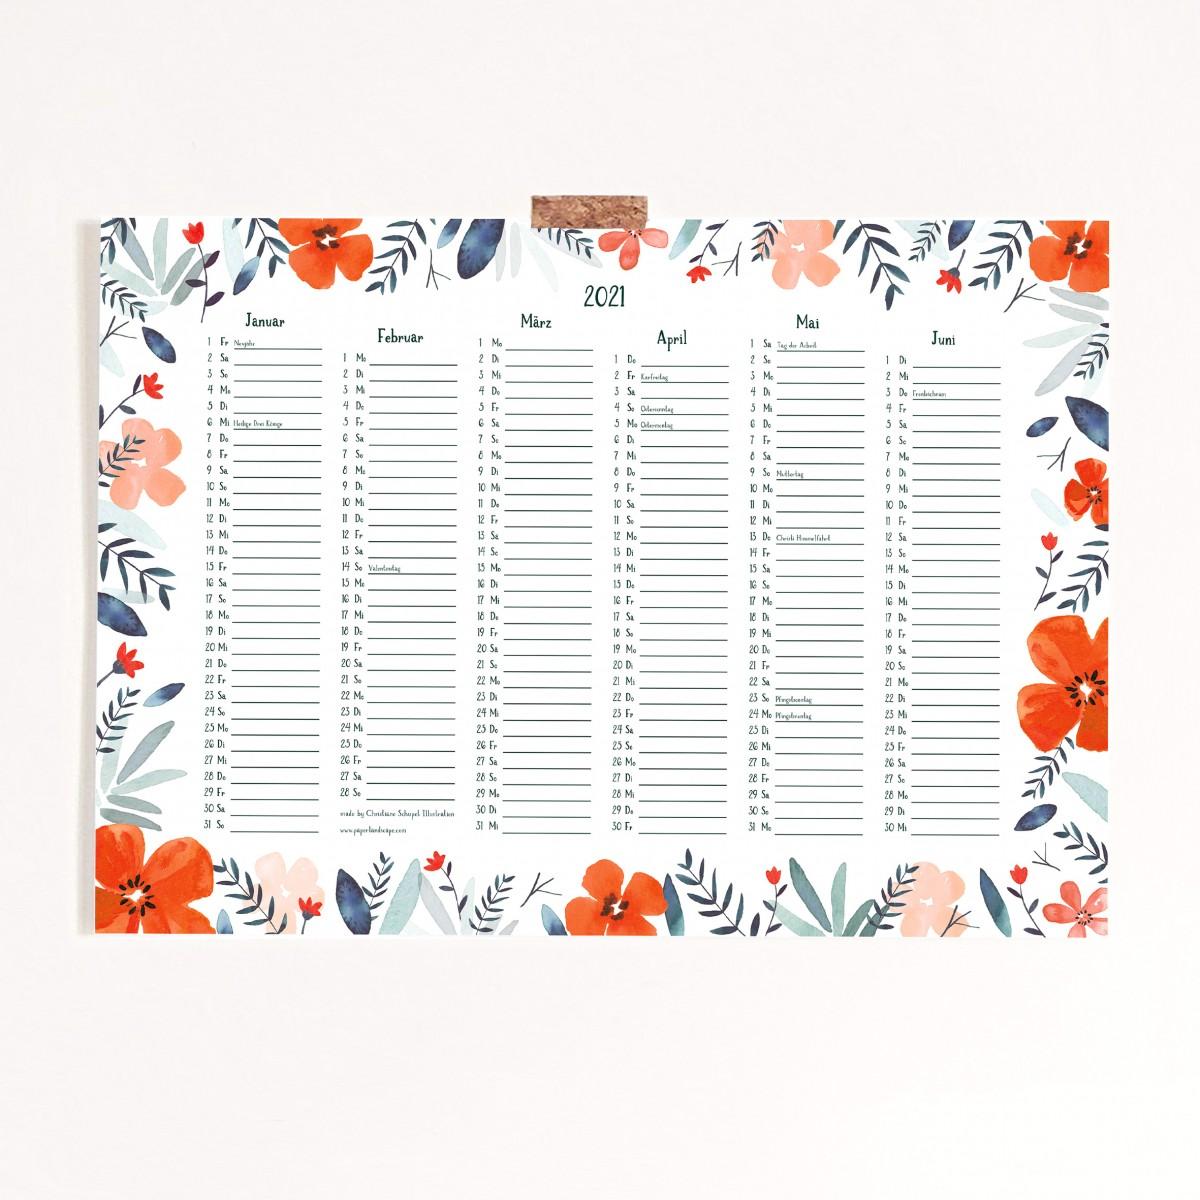 Paperlandscape | Kalender 2021 | Posterkalender A3 | Pflanzen Kalender | botanisch | Wildblumen